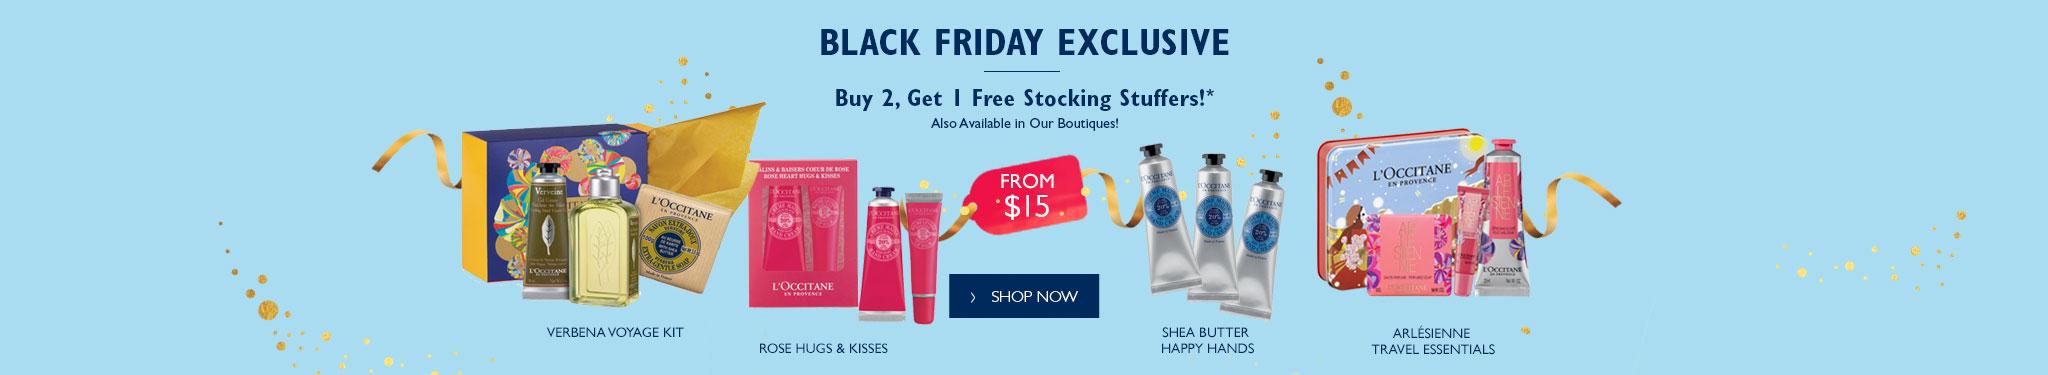 Black Friday Buy 2 Get 1 Free stocking stuffers